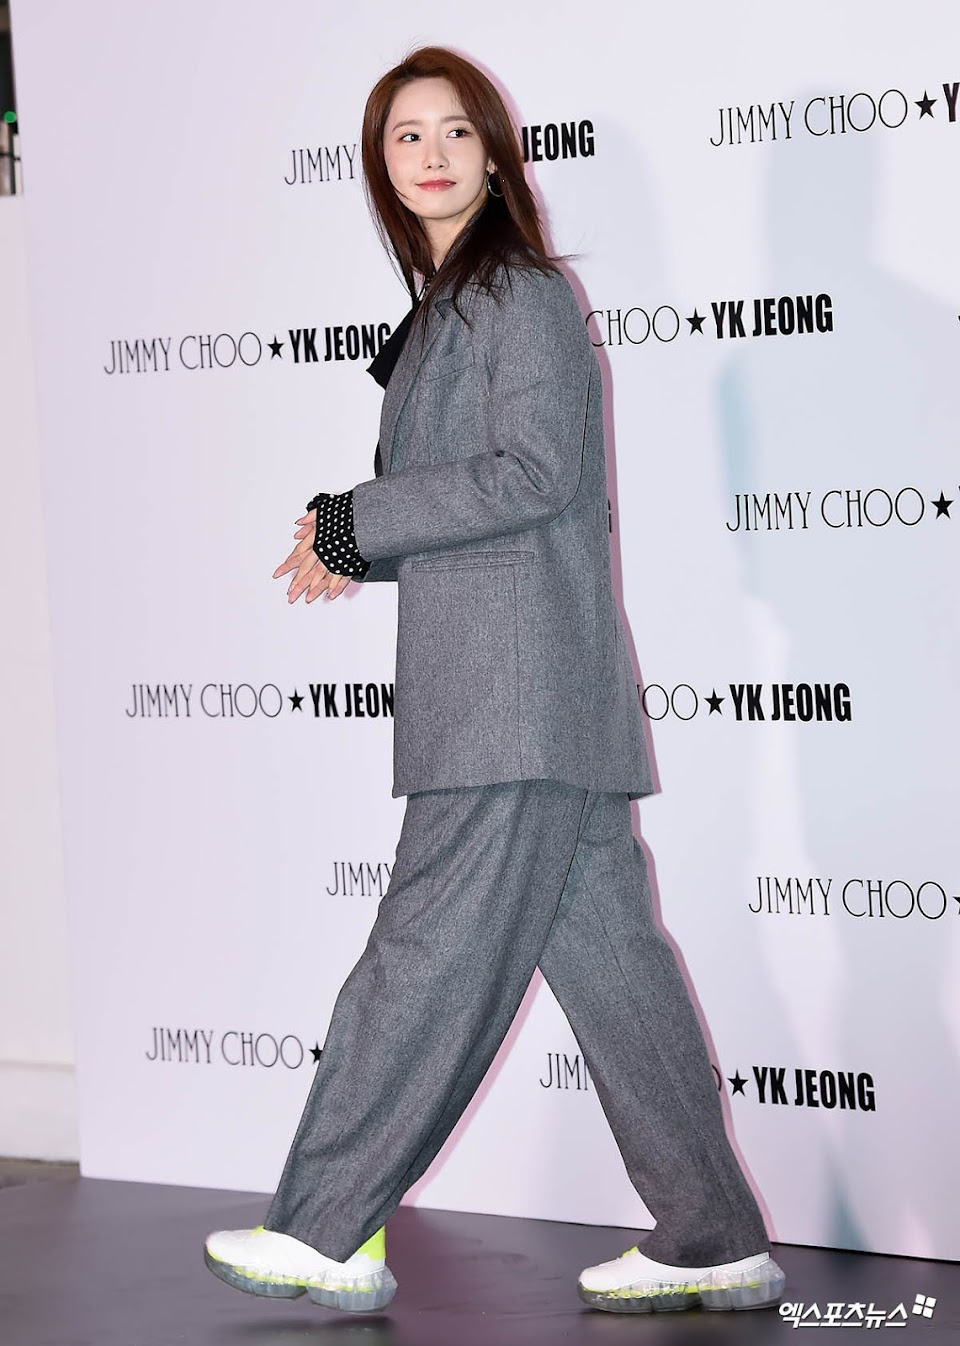 yoona suit 2